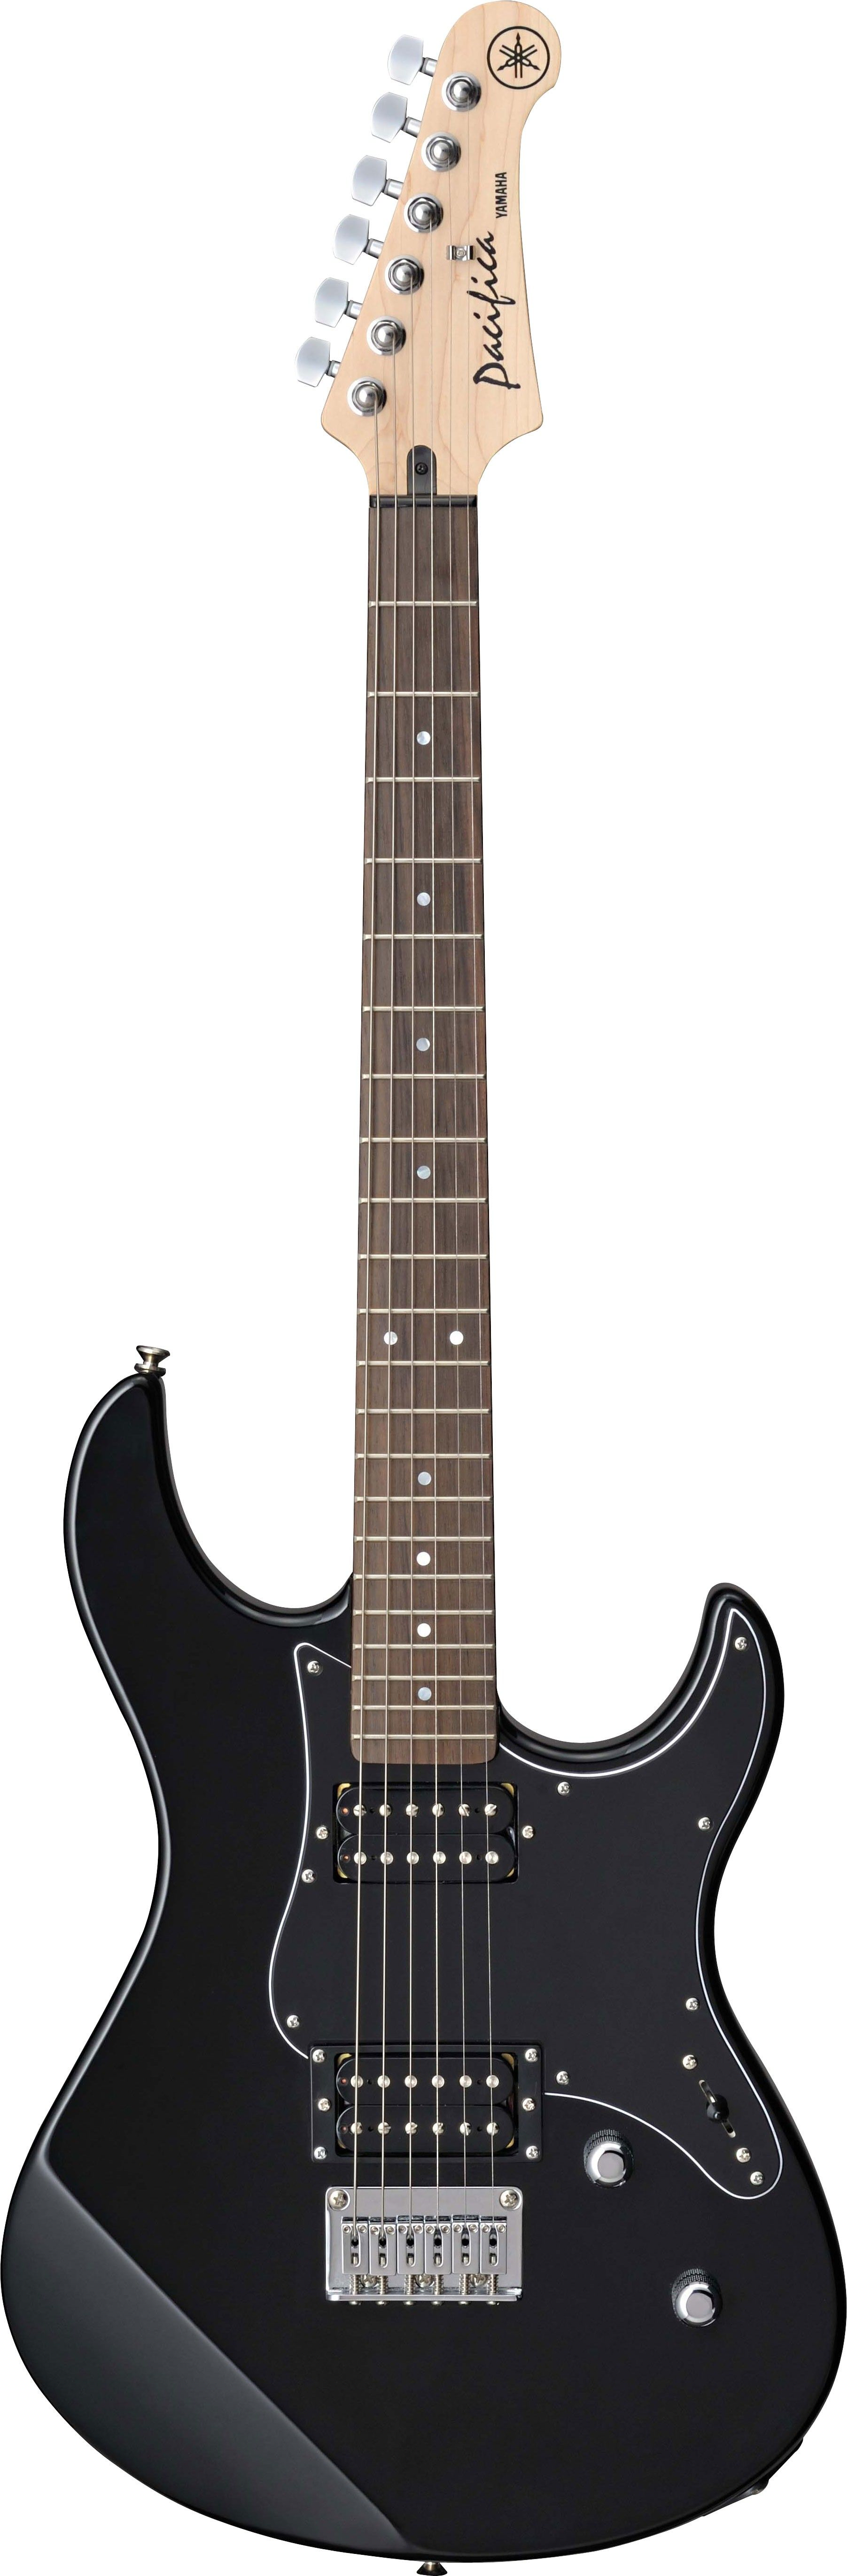 Yamaha Pacifica 120H BL | Guitars, Yamaha guitars and Music ...